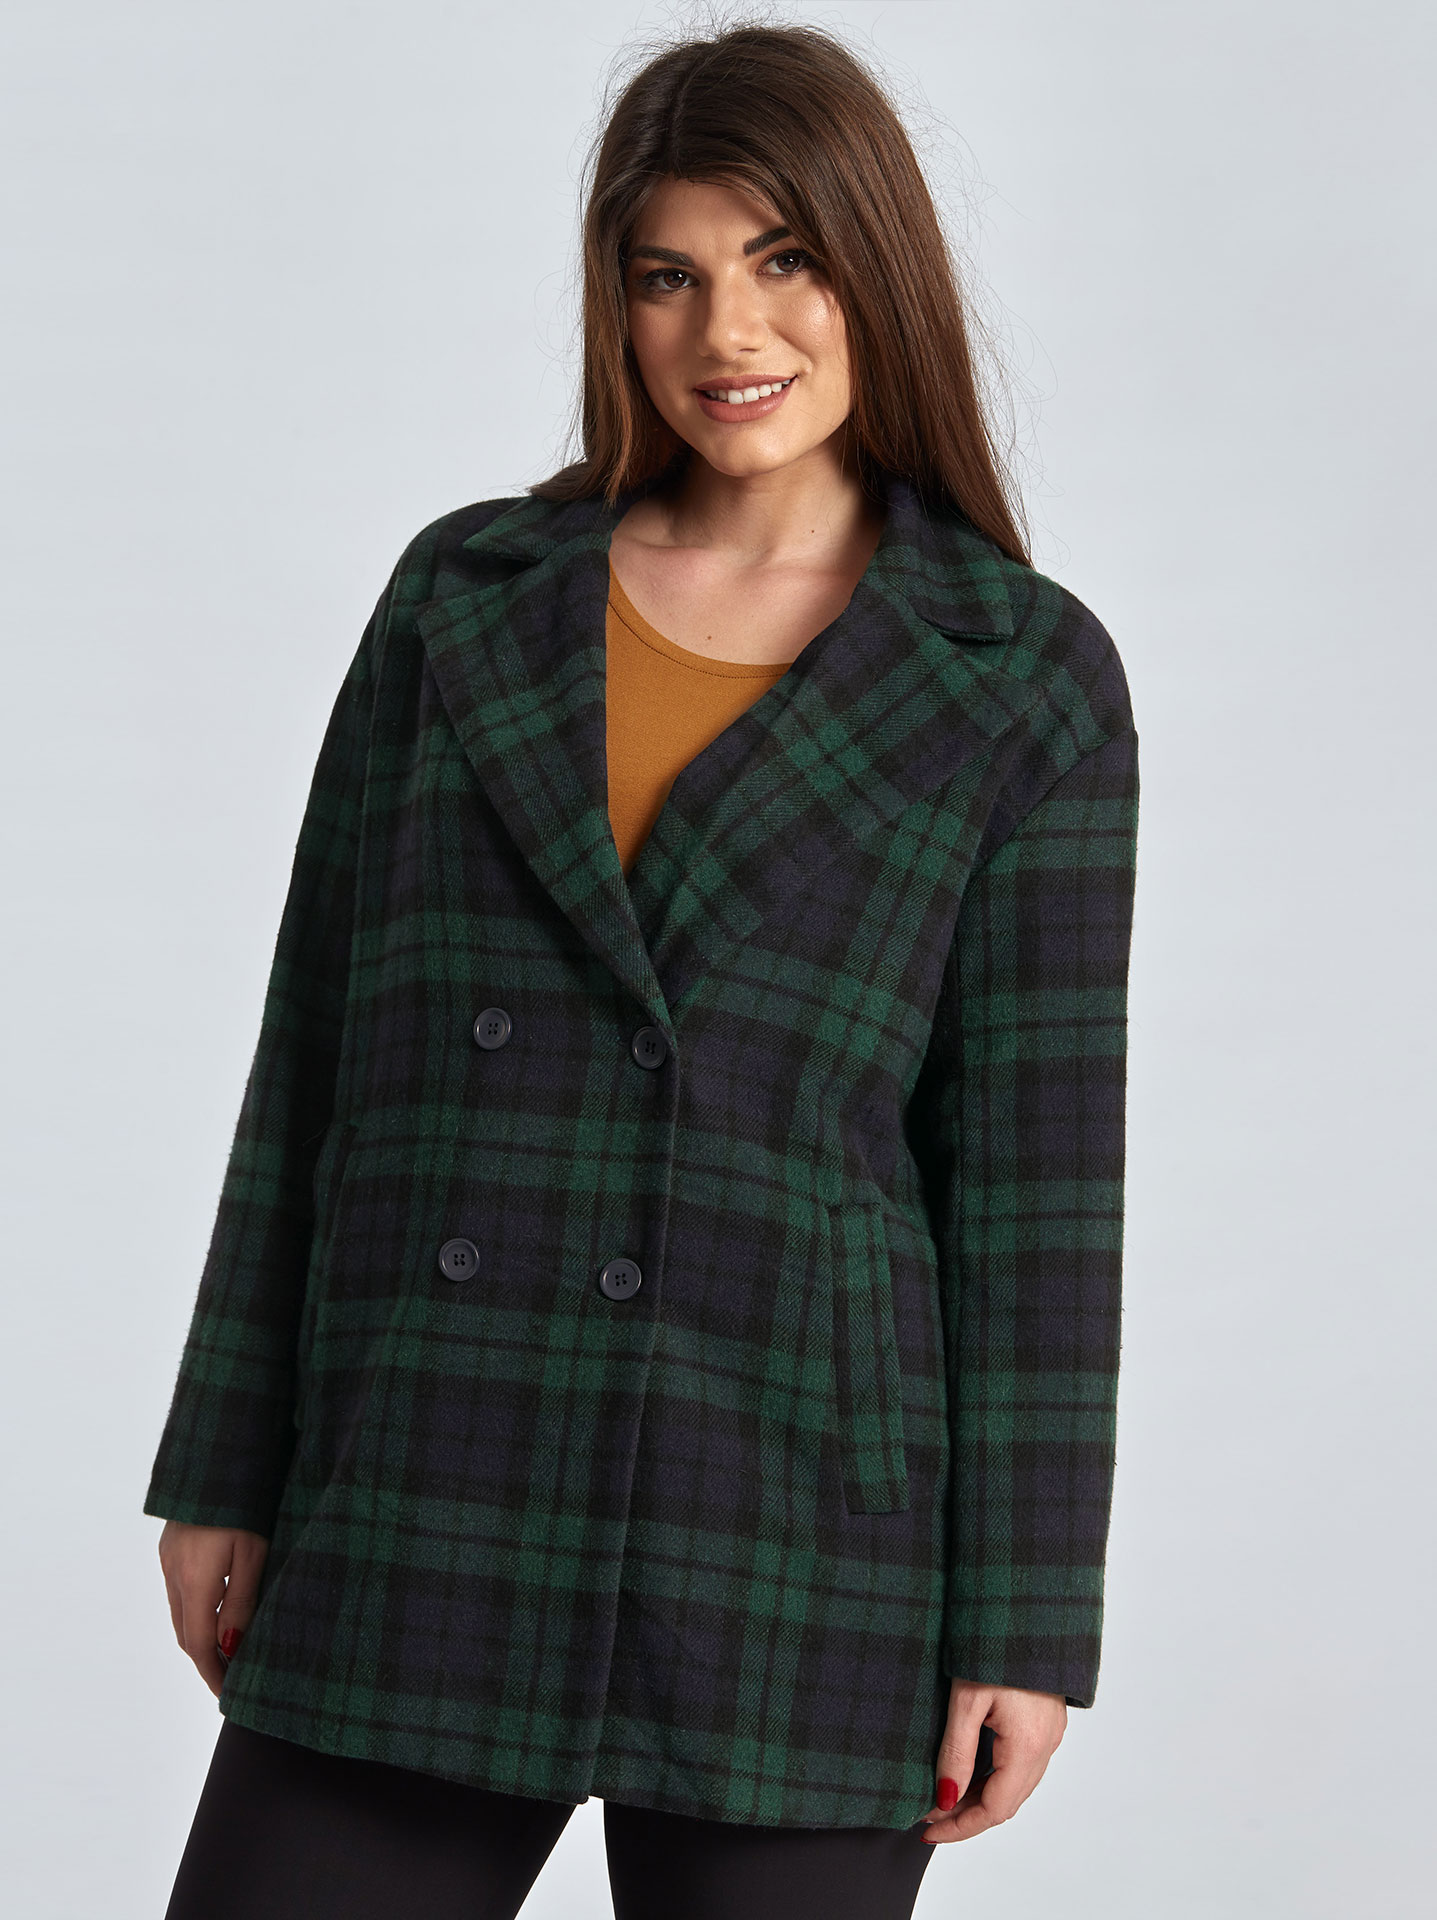 Oversized καρό παλτό curvy σε πρασινο e71a3979481